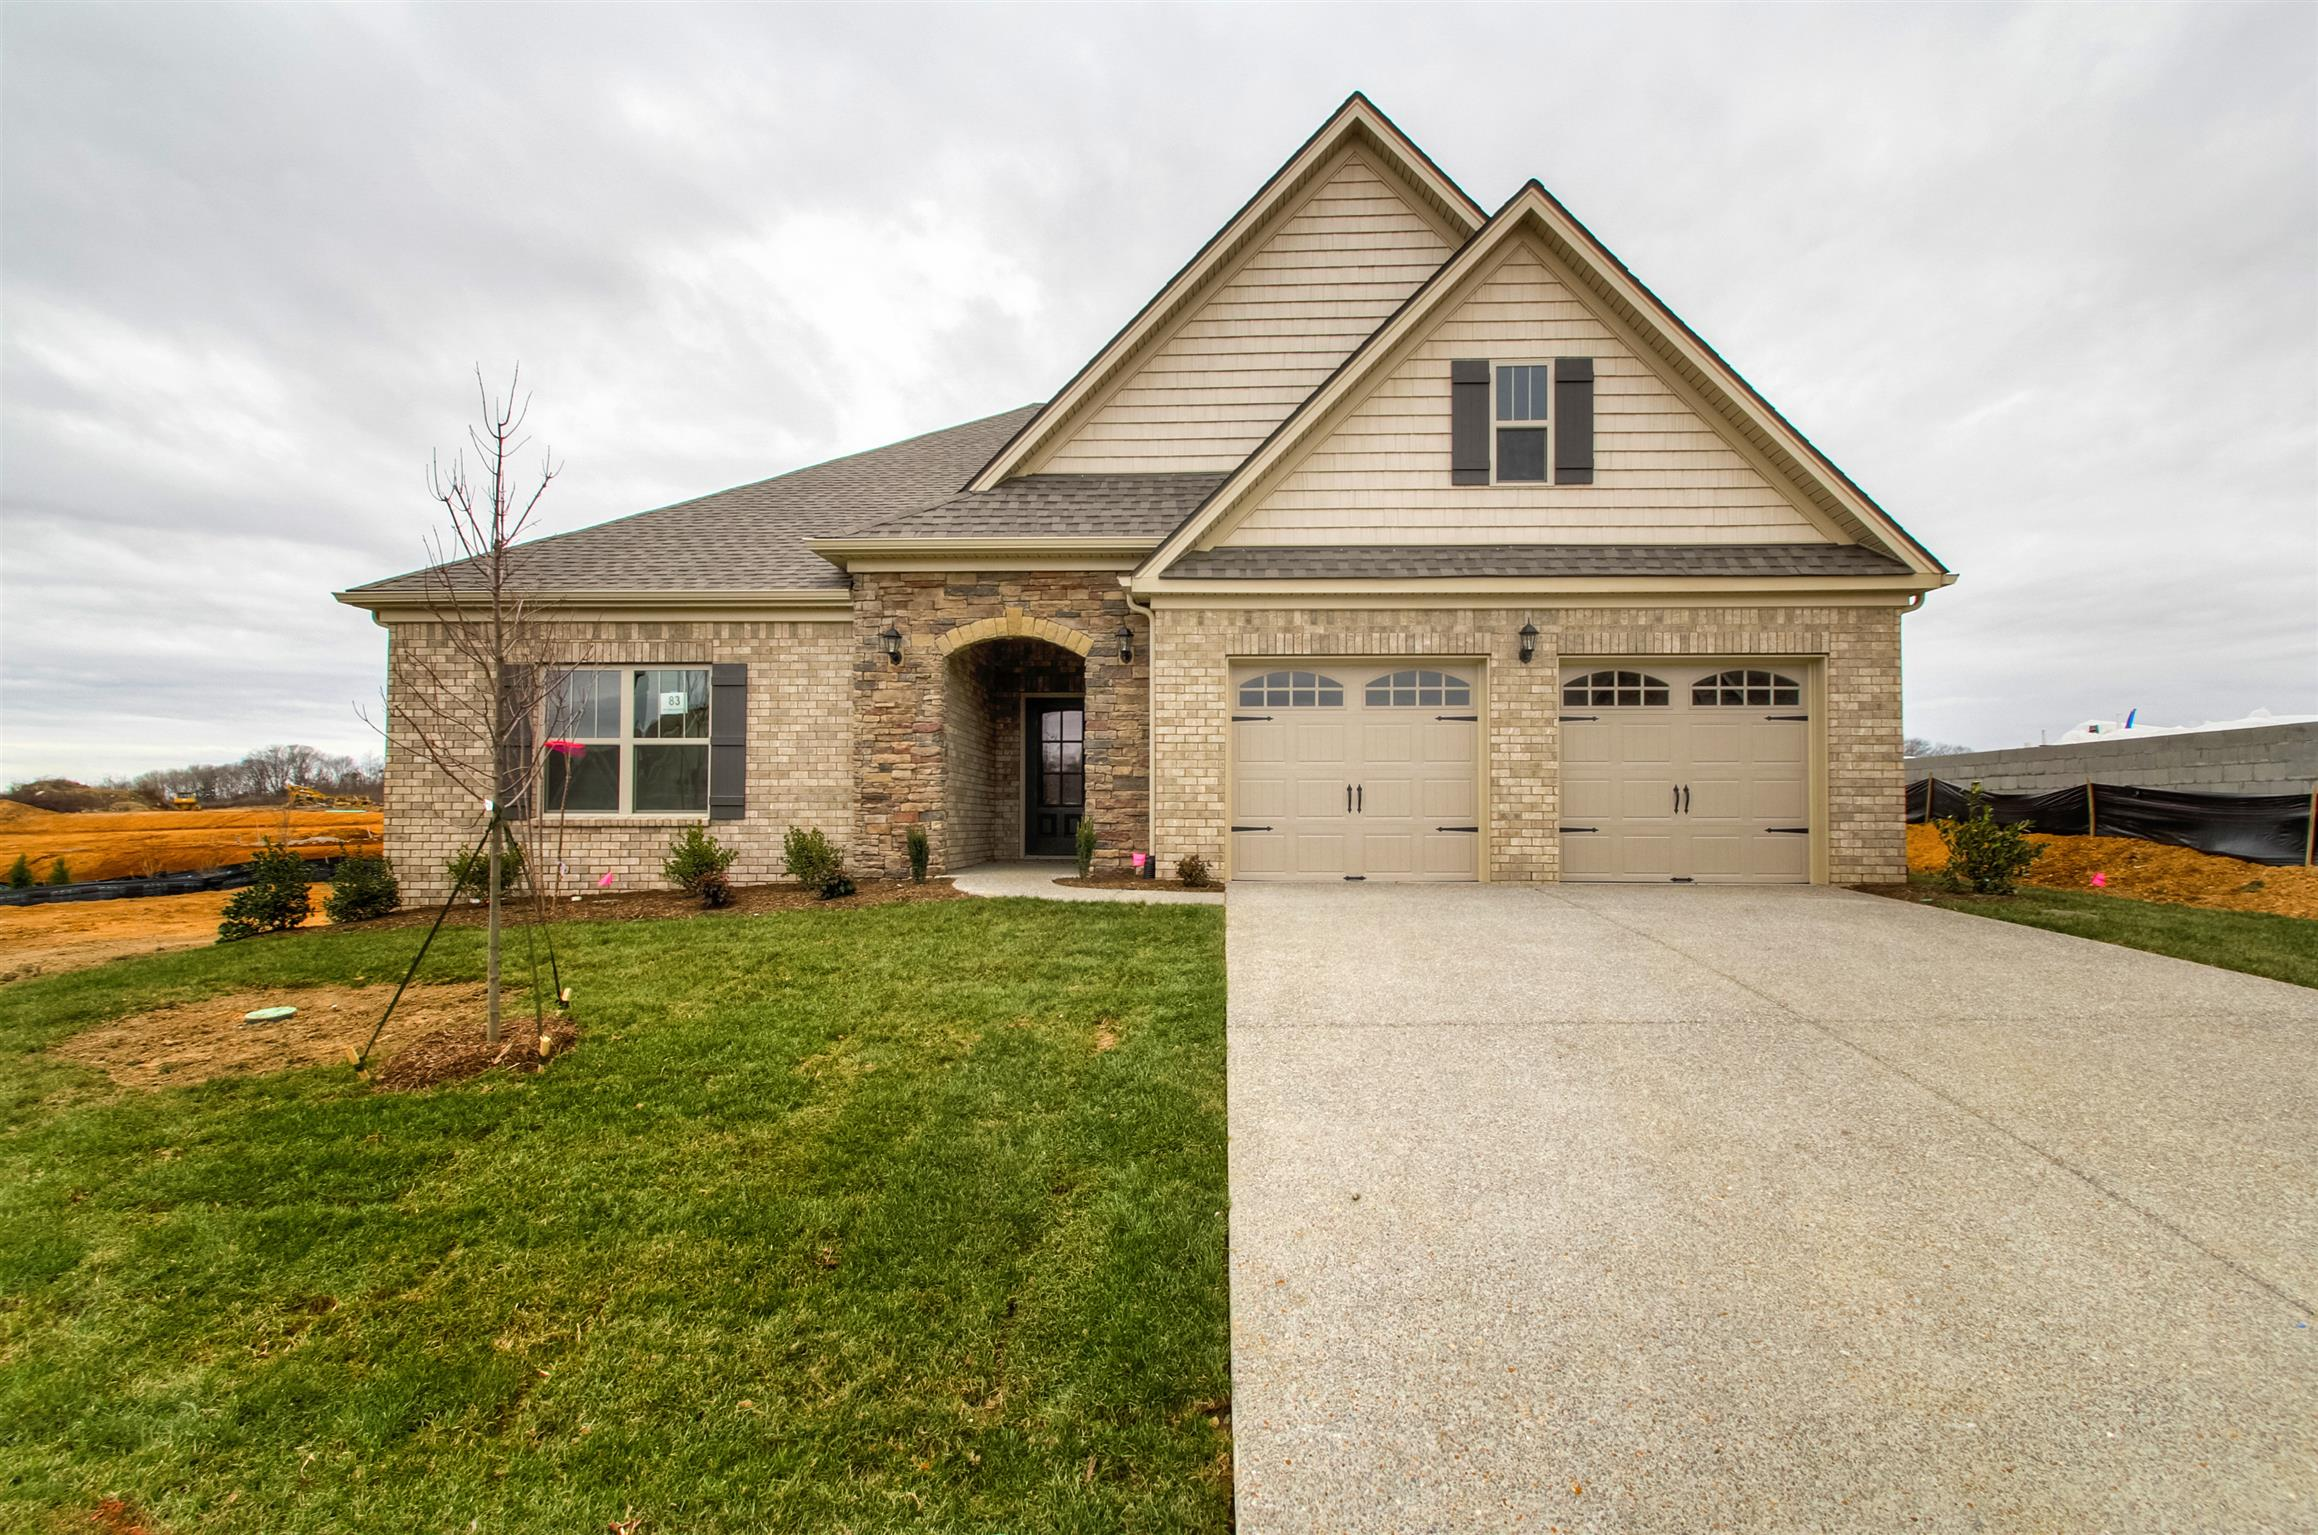 723 Pebble Creek Ln #632, Lebanon, TN 37090 - Lebanon, TN real estate listing